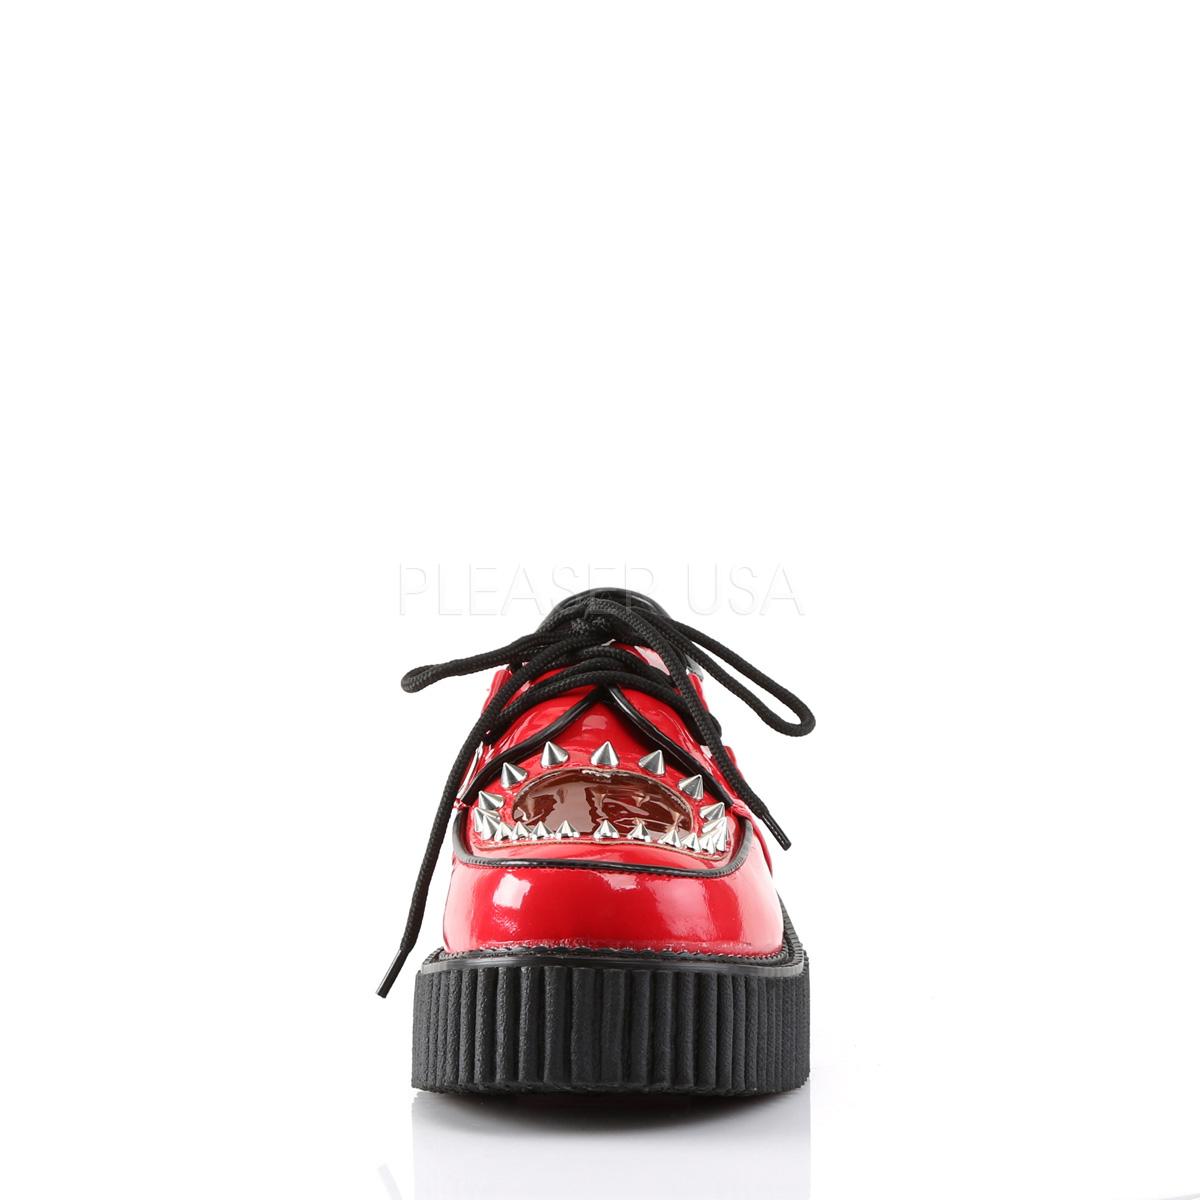 rød 5 cm CREEPER 108 creepers sko for dame platåsko med tykke såler